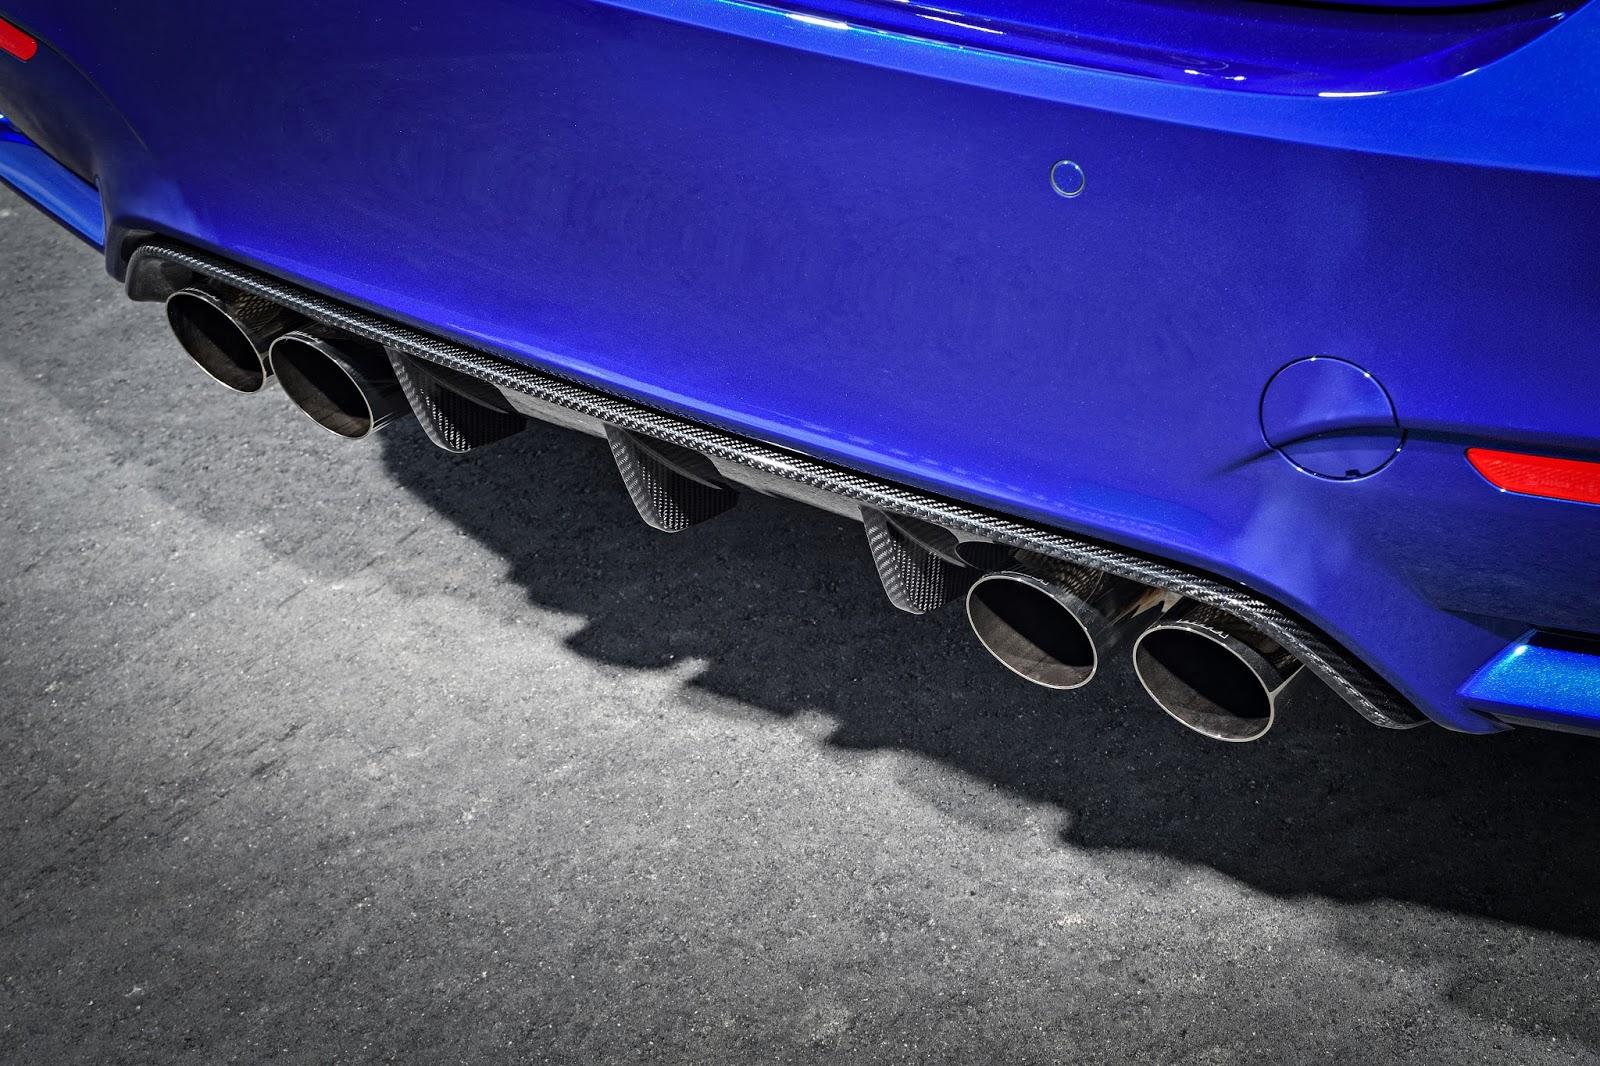 P90251053 highRes the new bmw m4 cs 04 Η περιορισμένης παραγωγής BMW M4 ClubSport δική σας με 116.900 ευρώ BMW, BMW M, BMW M4, BMW M4 CS, BMW Motorsport, clubsport, COUPE, Limited edition, supercars, supersport, videos, Περιορισμένης παραγωγής